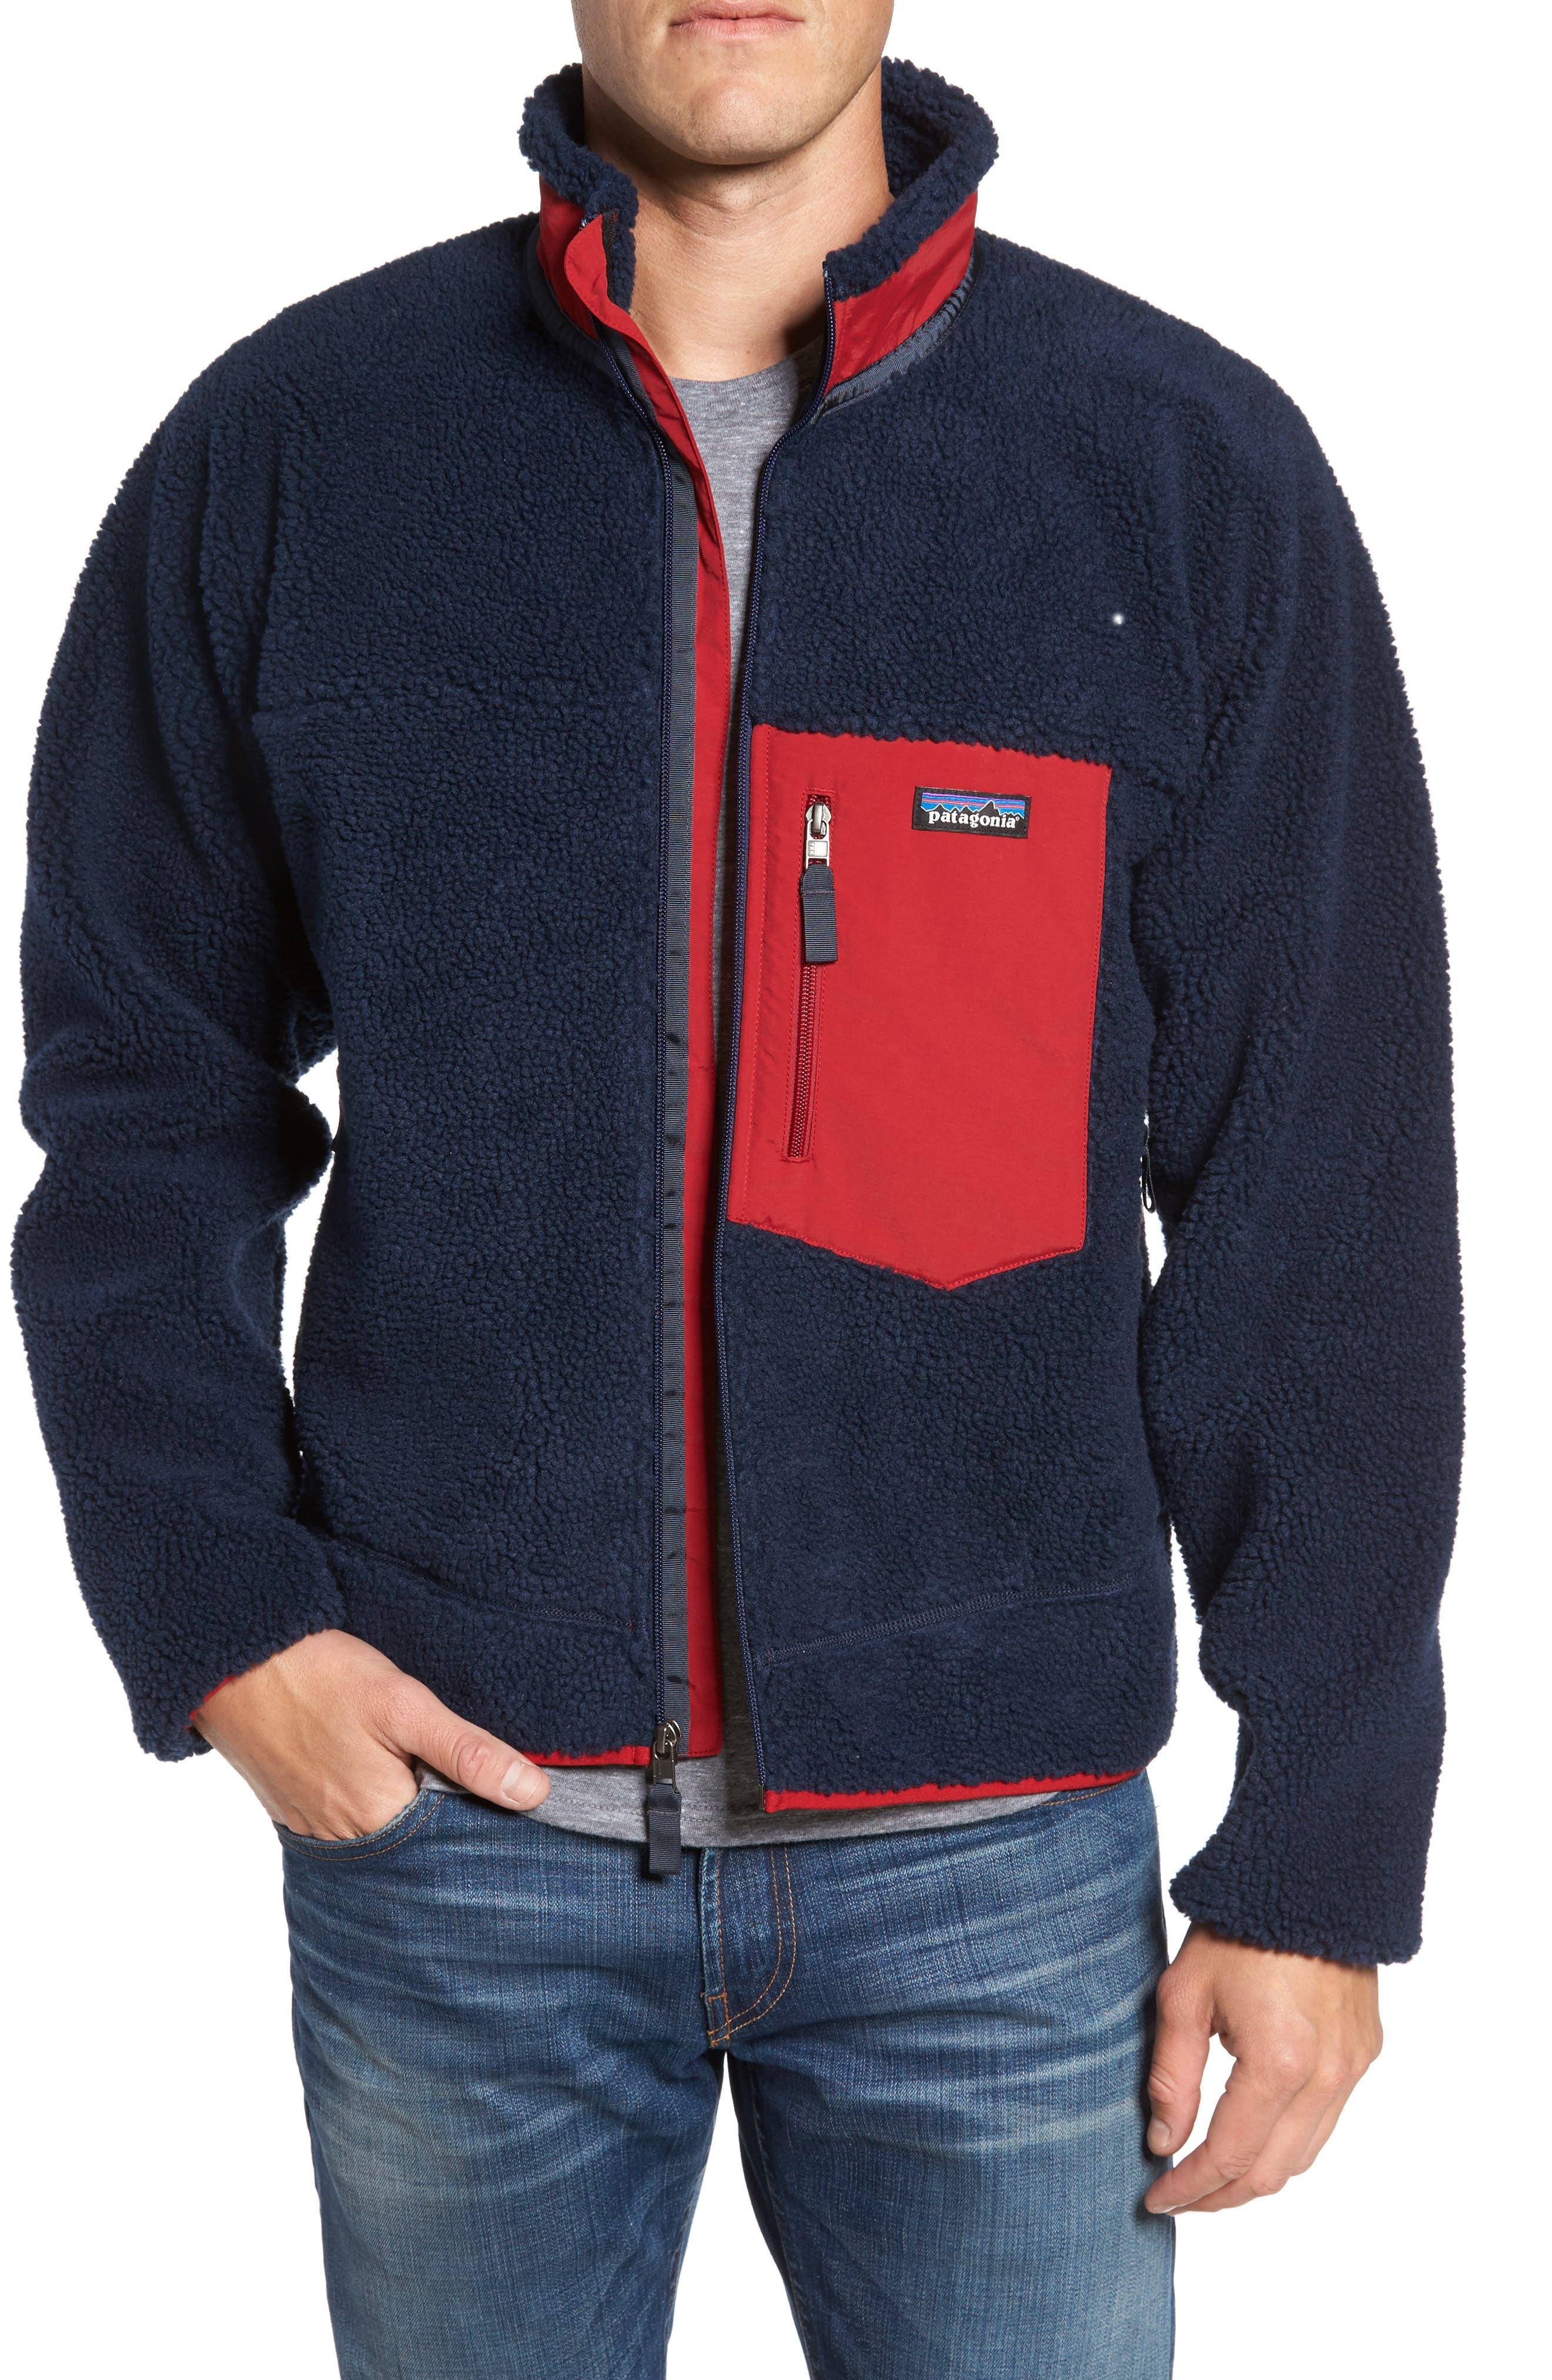 Alternate Image 1 Selected - Patagonia Retro-X Fleece Jacket